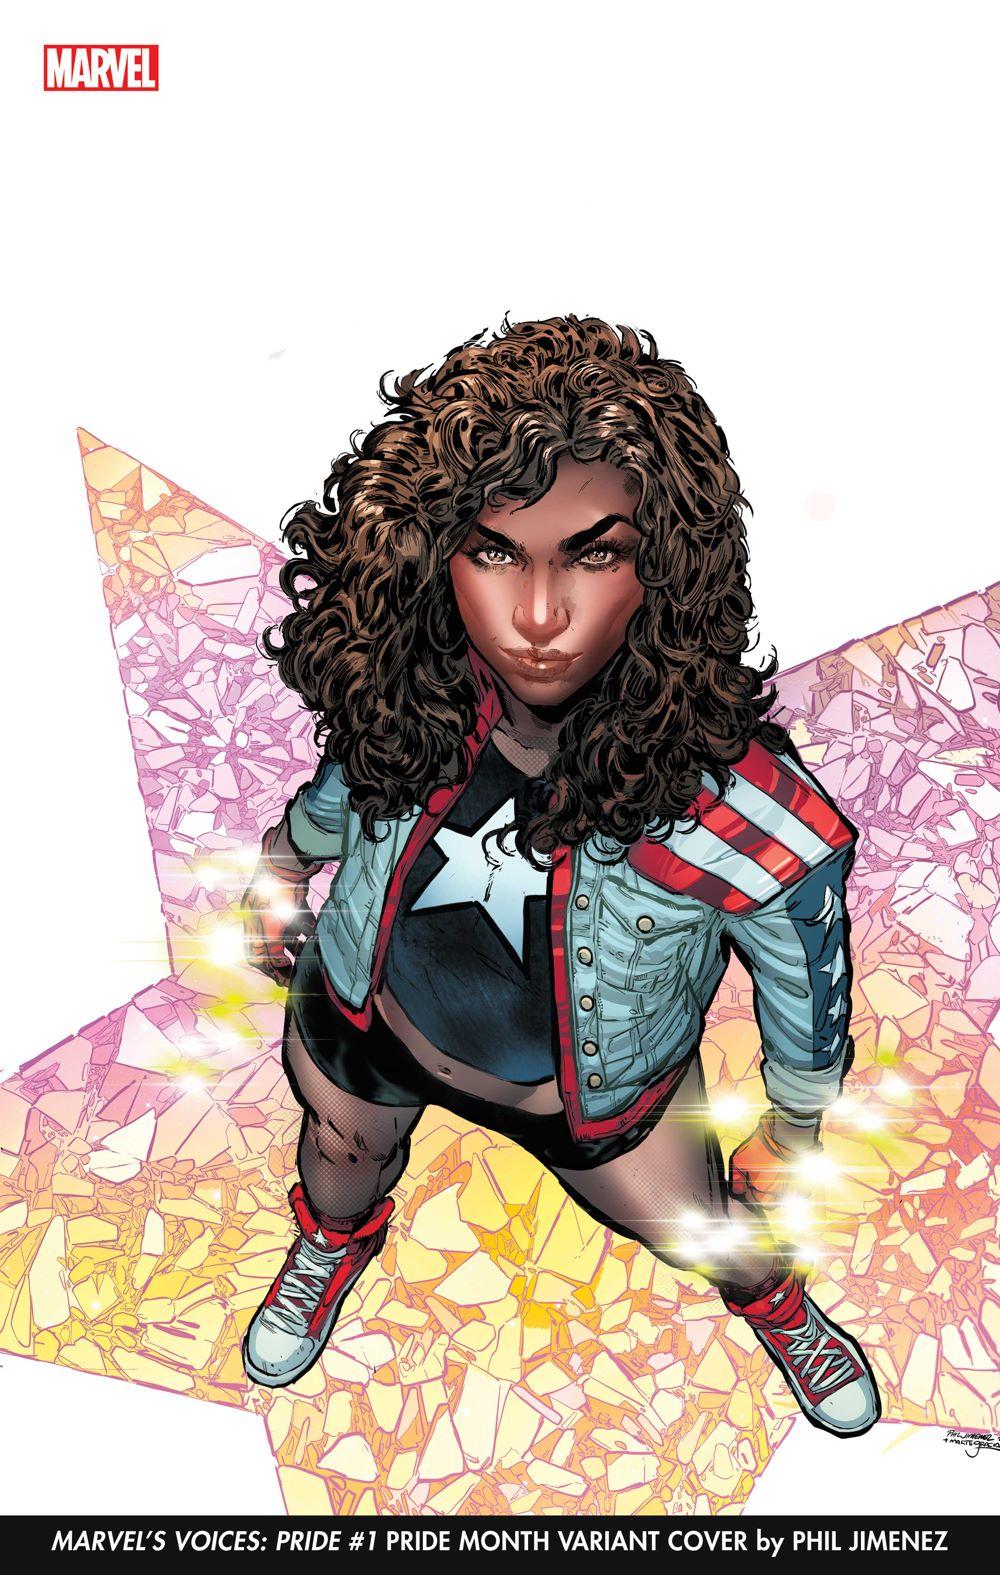 MARVOICESPRIDE2021001_PrideVar Phil Jimenez will provide covers for Marvel's Pride Month celebration